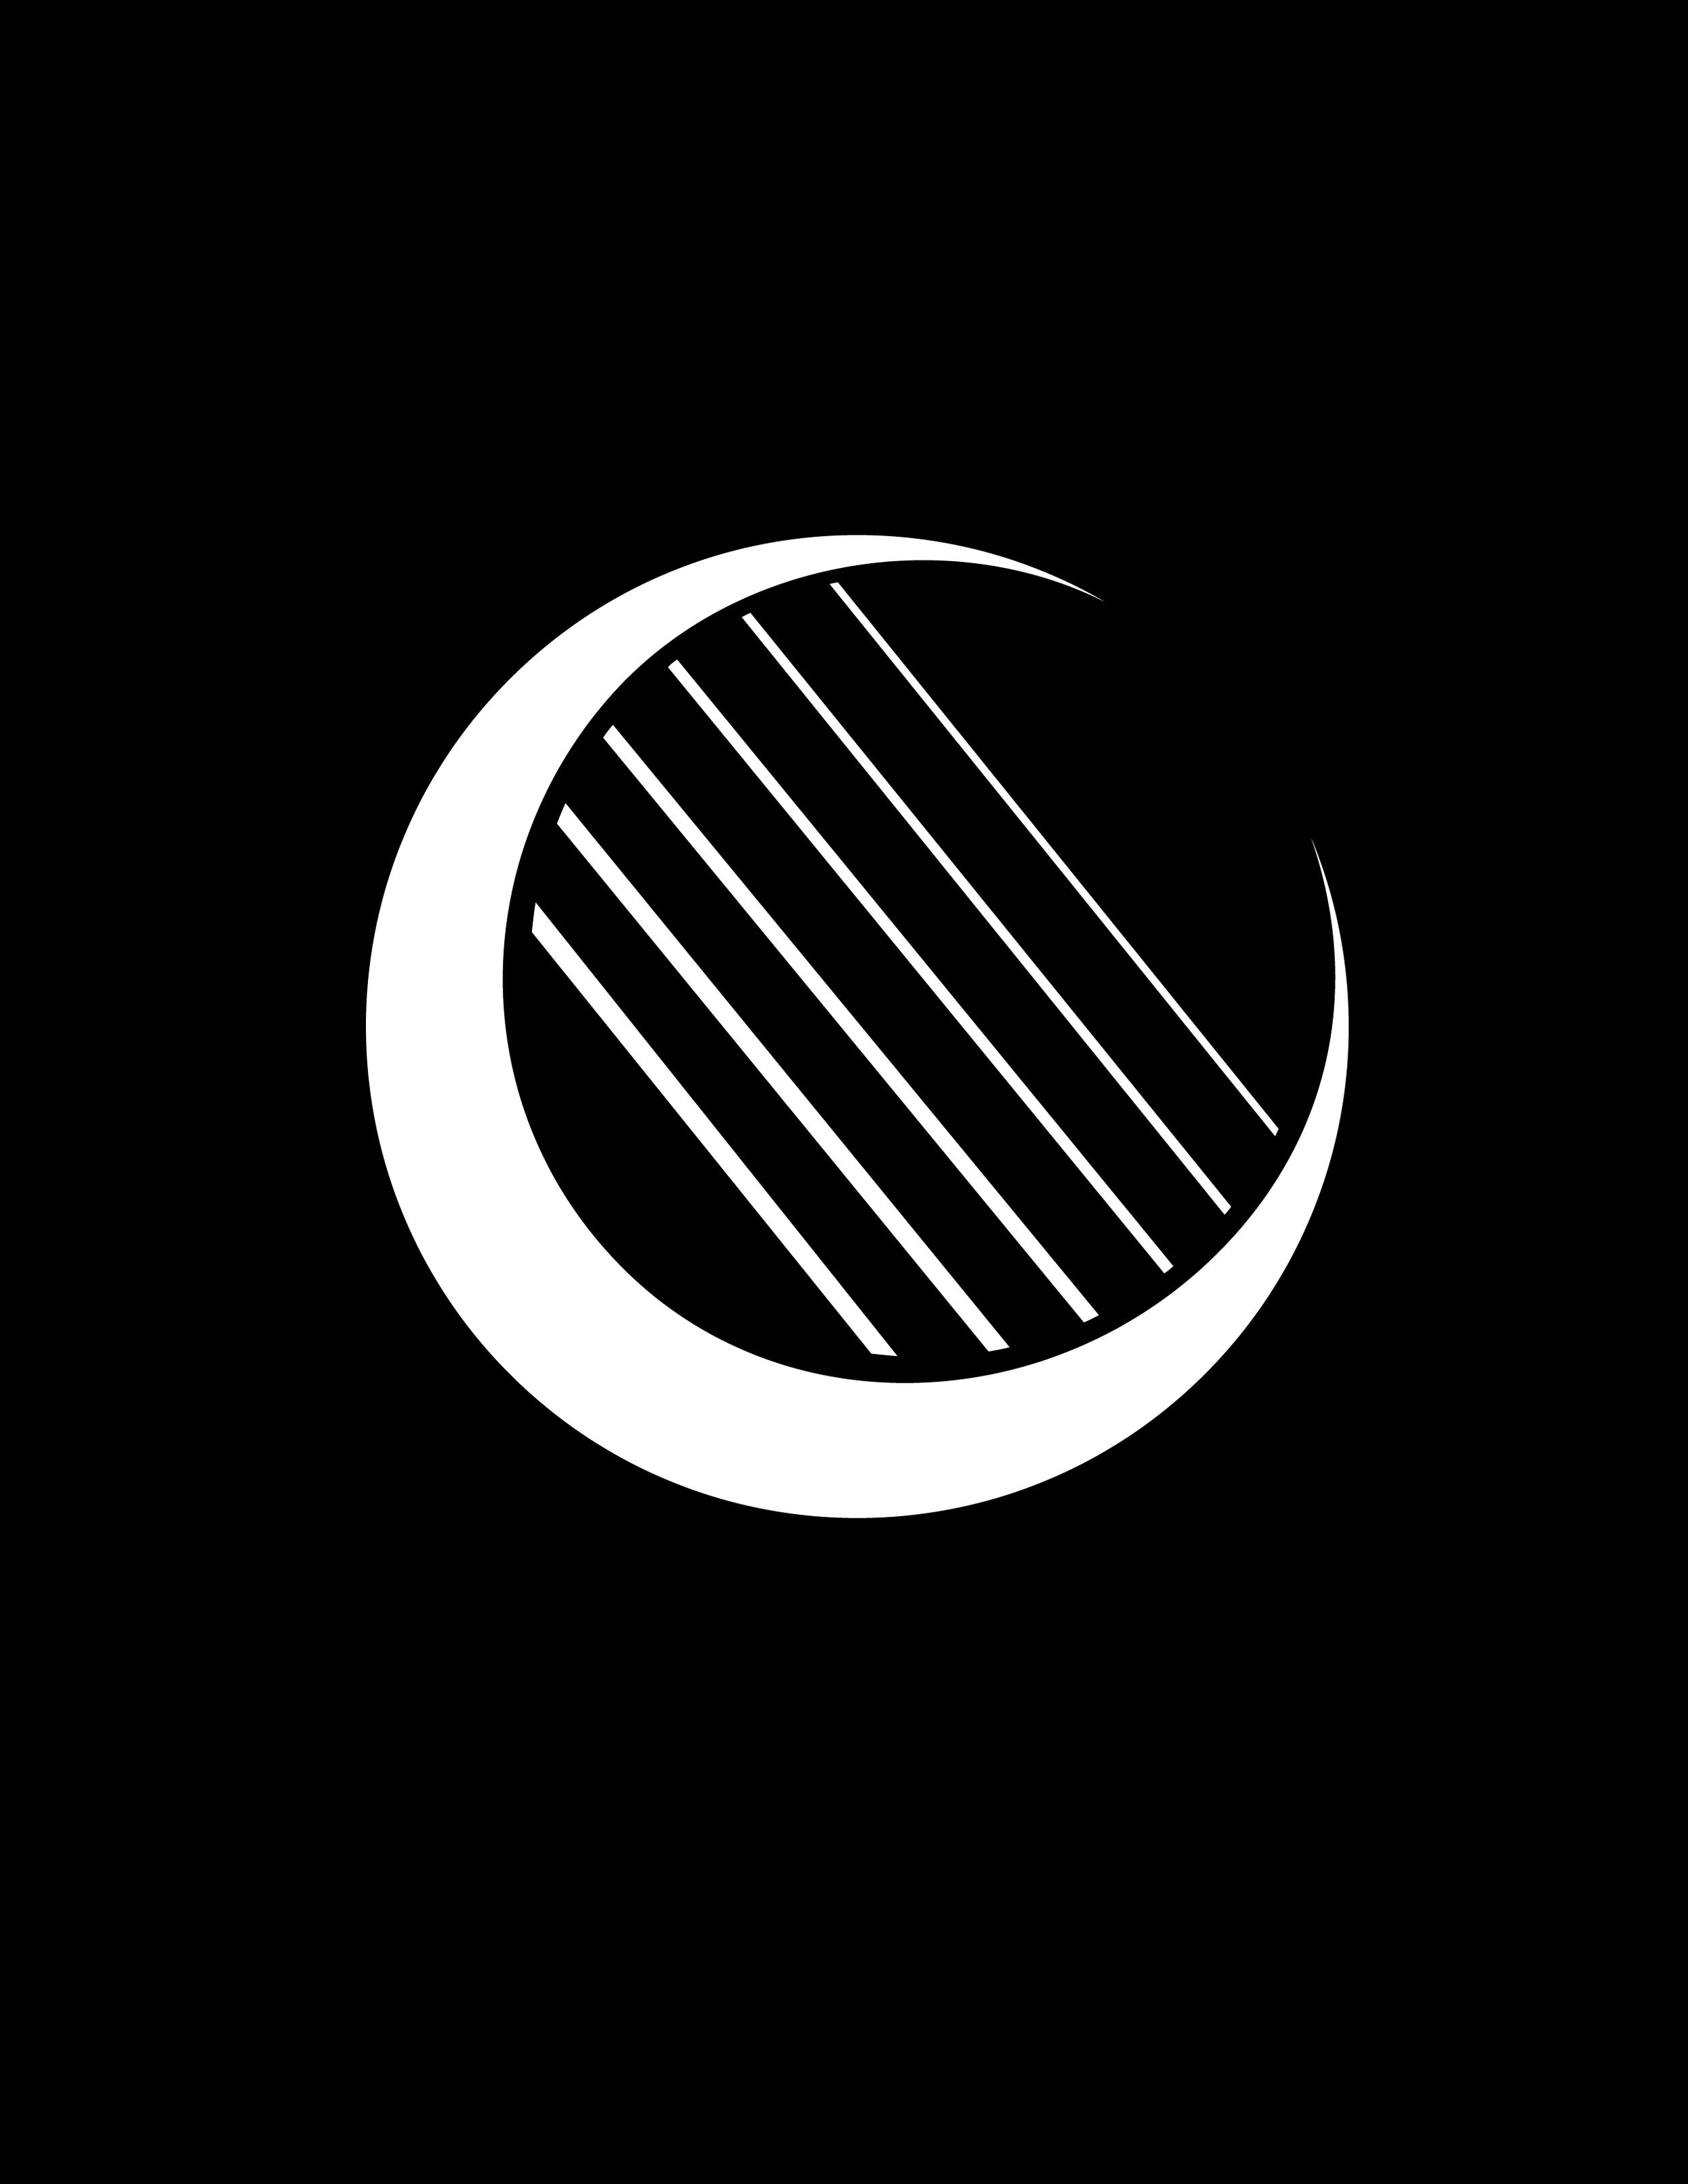 HarpMoon-Web-02-02.png